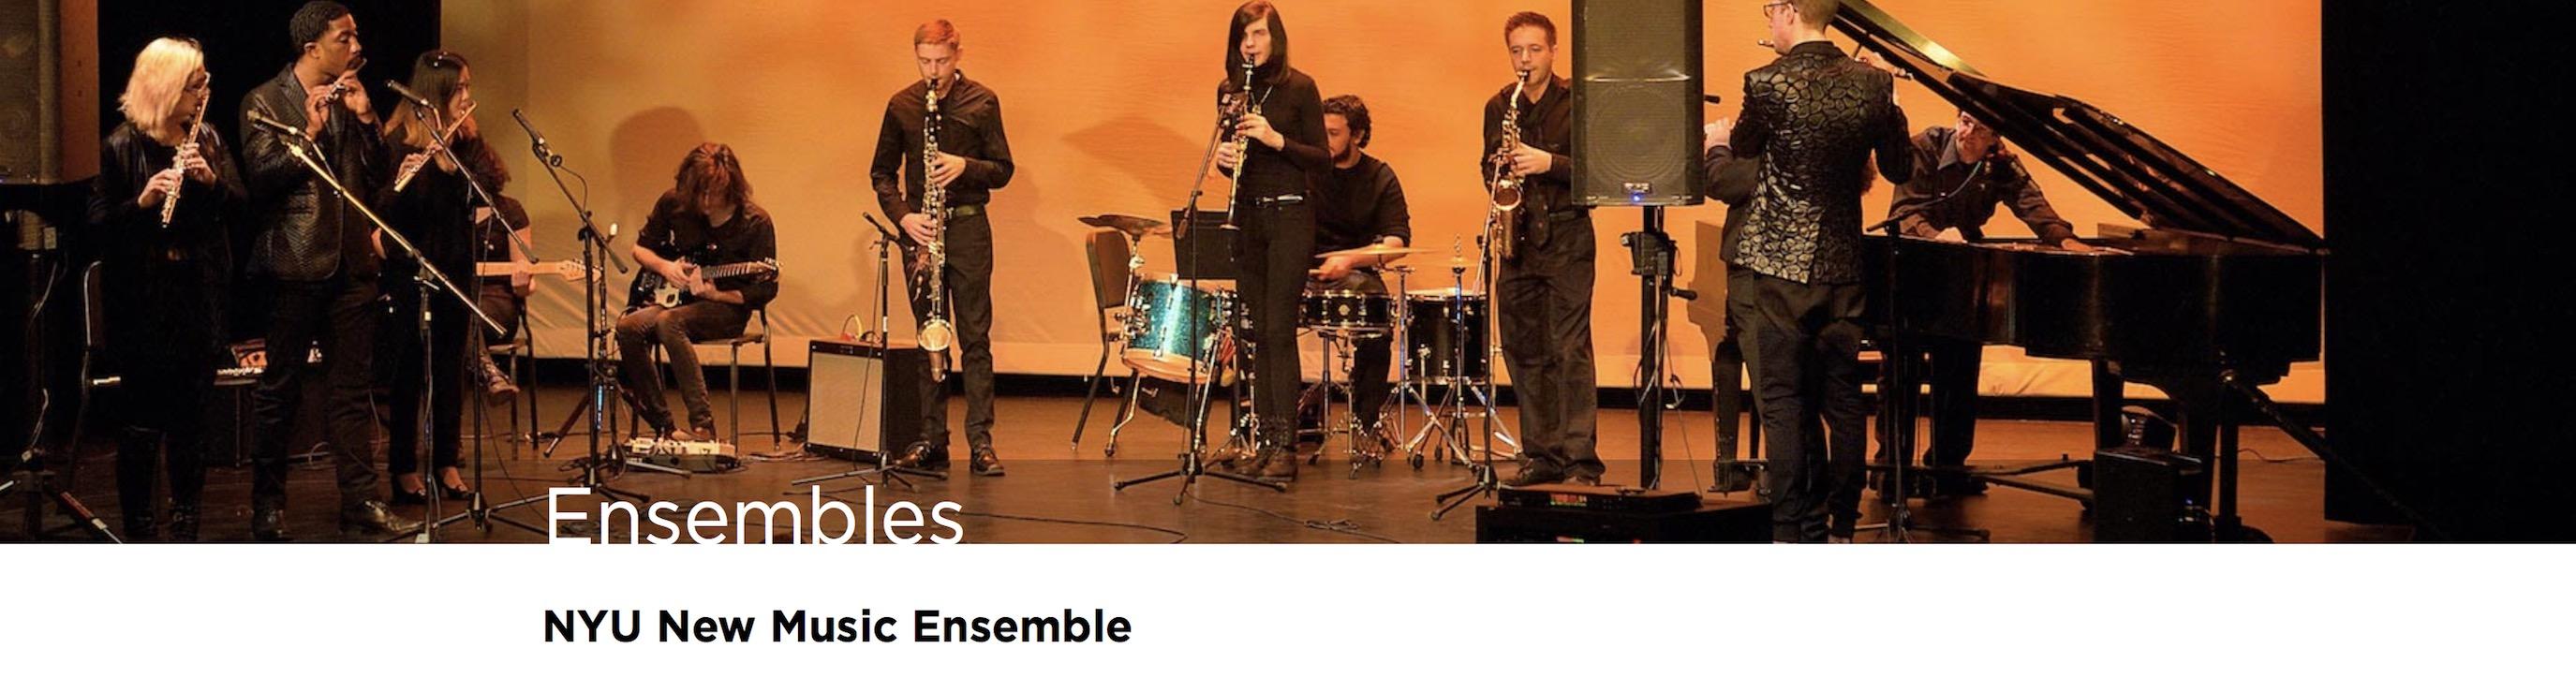 NYU New Music and Dance Ensemble